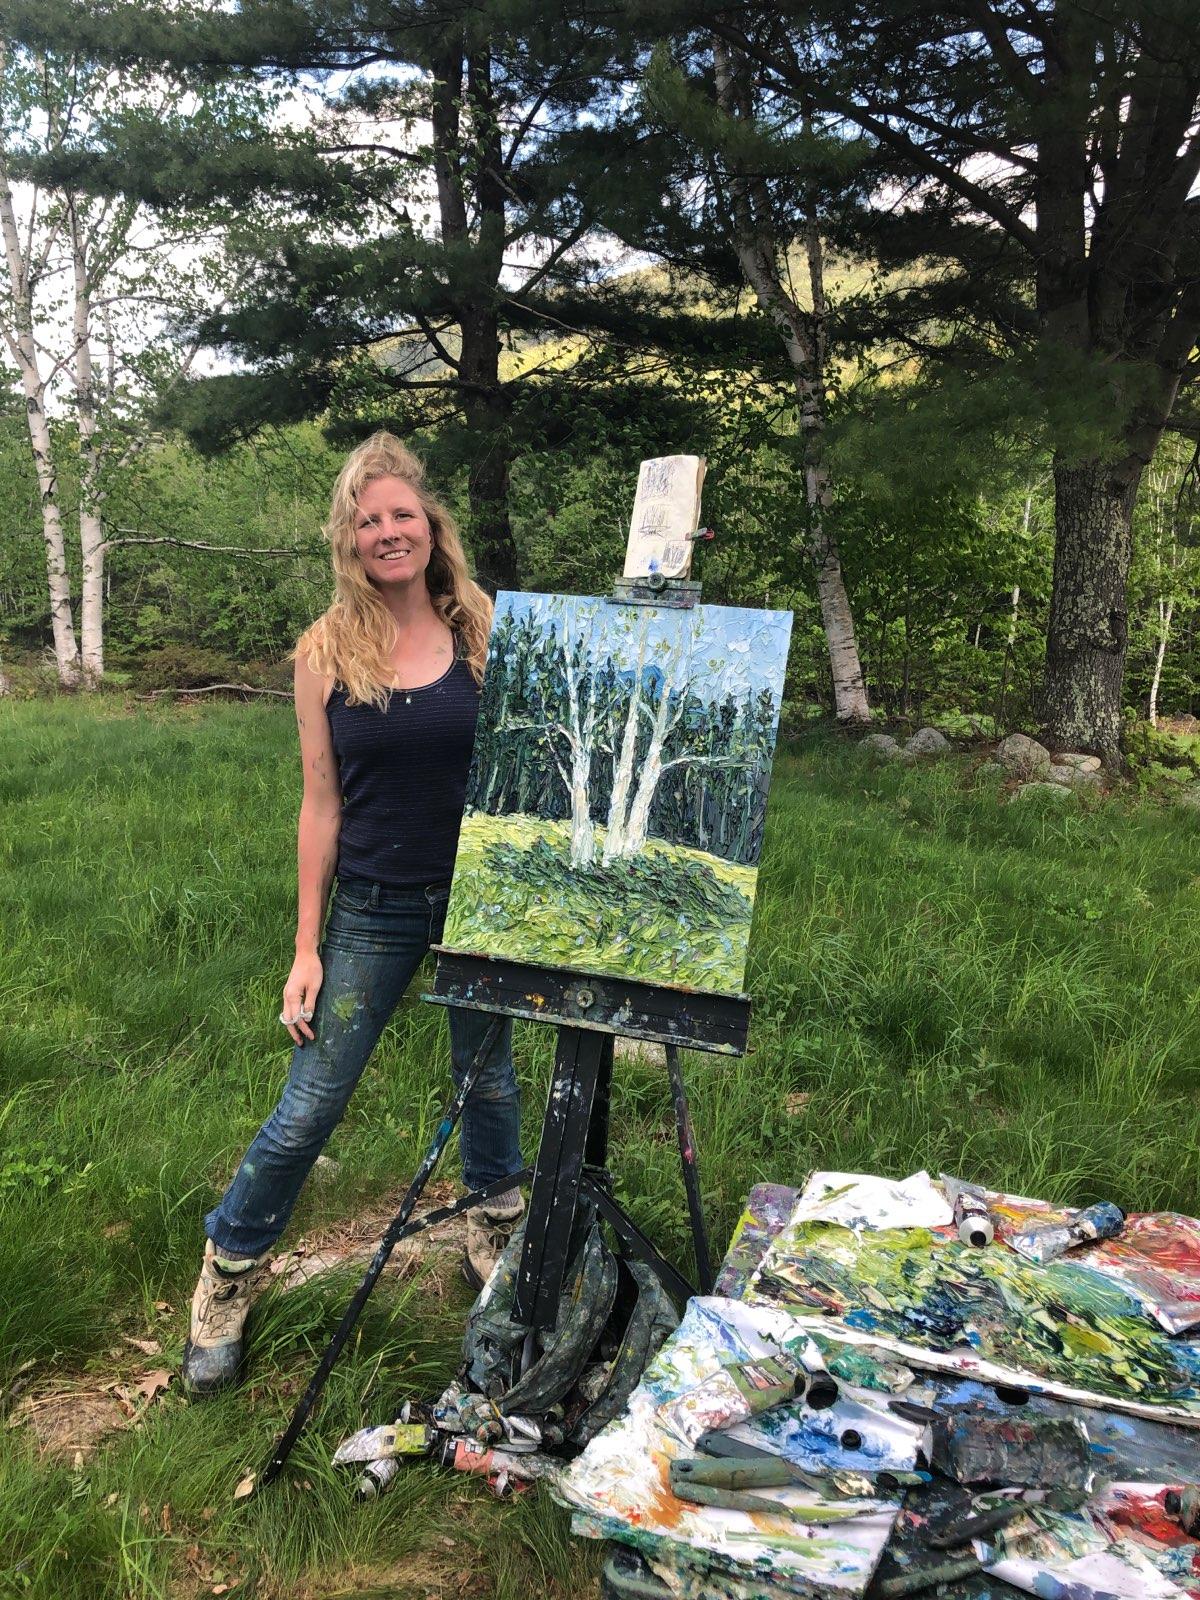 Mountain Road, Tamworth, NH  Birch Trees, 24x20in, oil on panel, $1,000